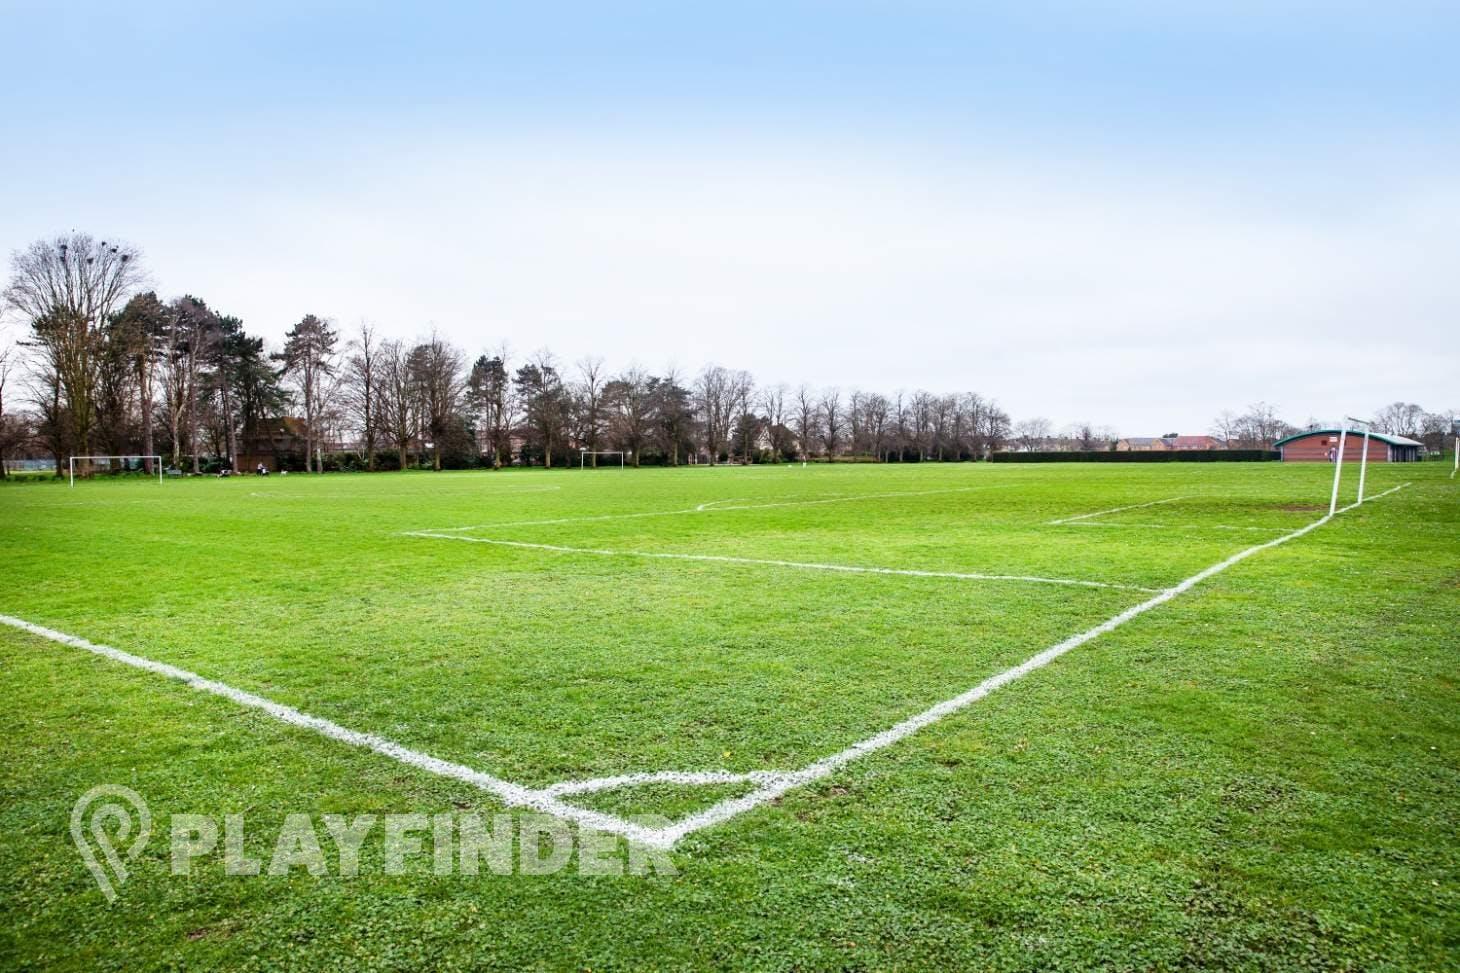 Jubilee Park 9 a side | Grass football pitch